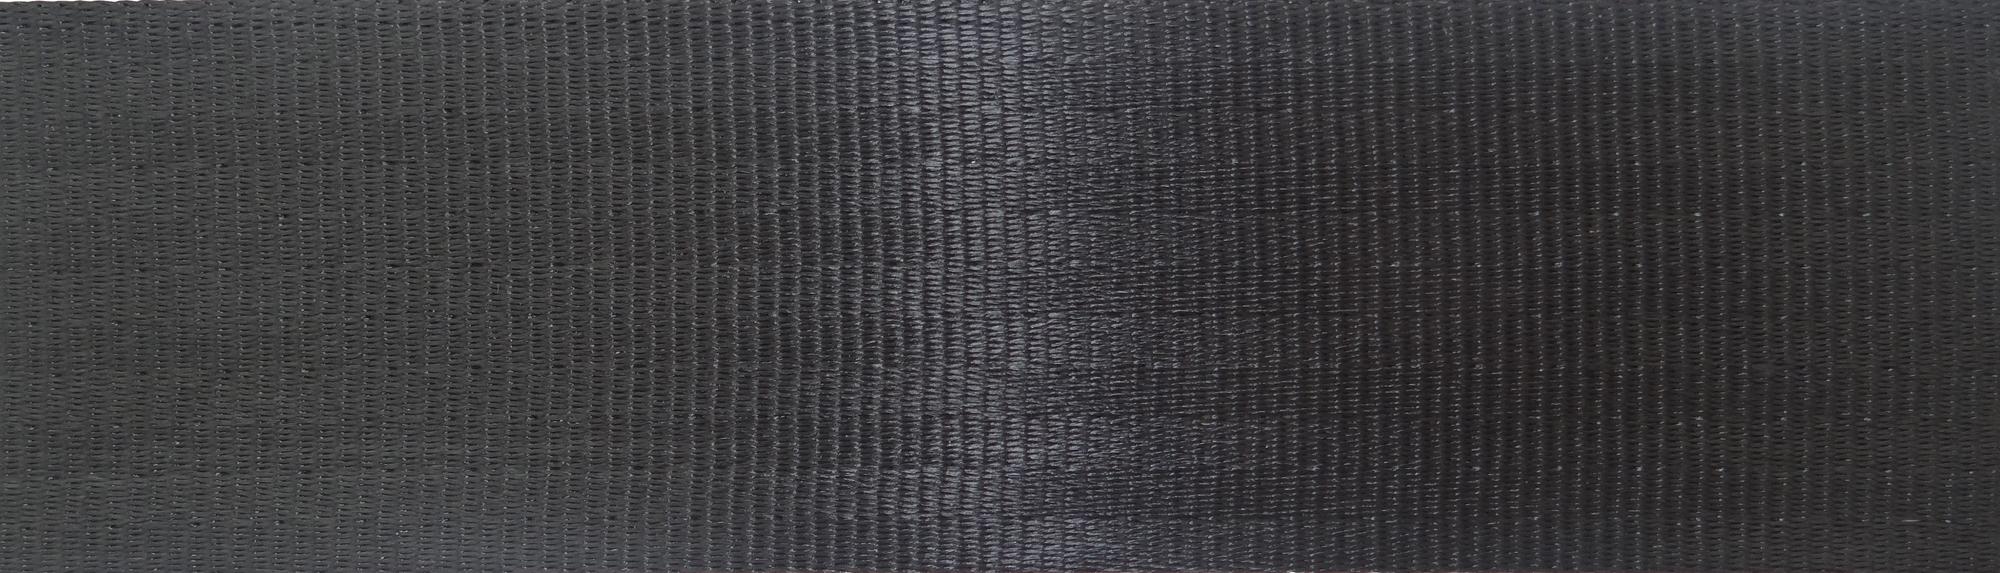 11 Panel Black